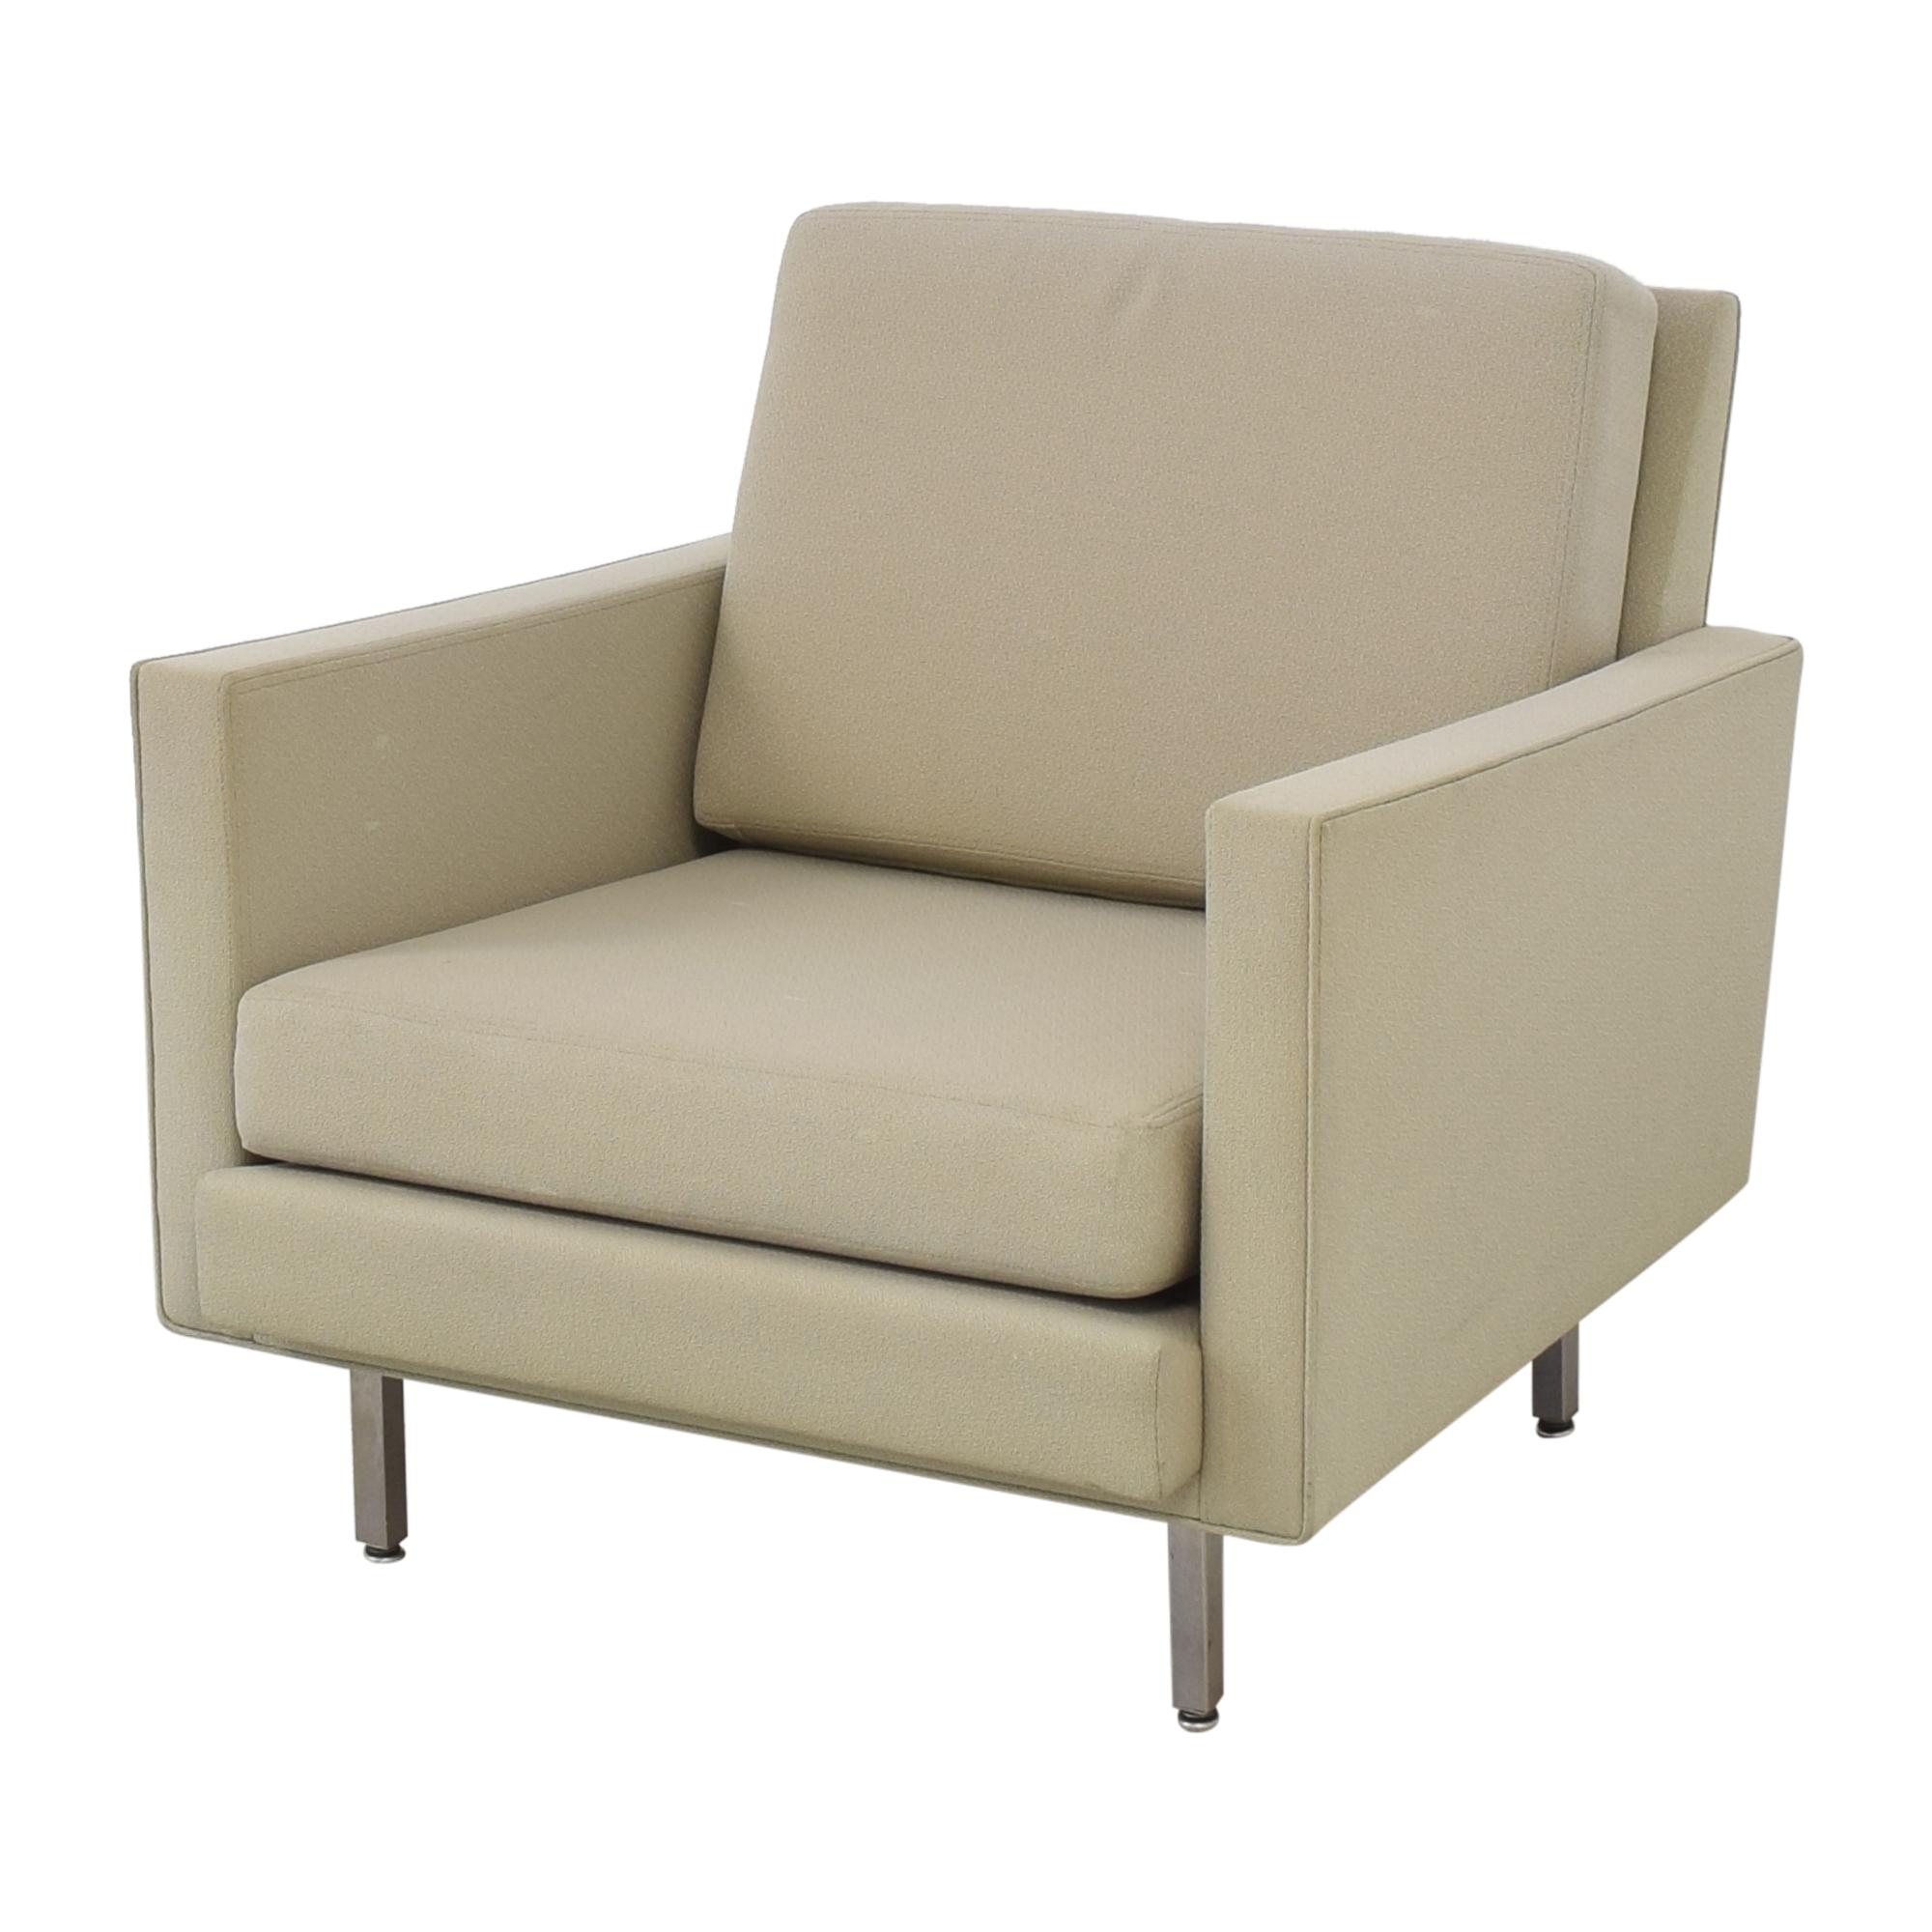 shop Modernica Case Study Furniture Chair Modernica